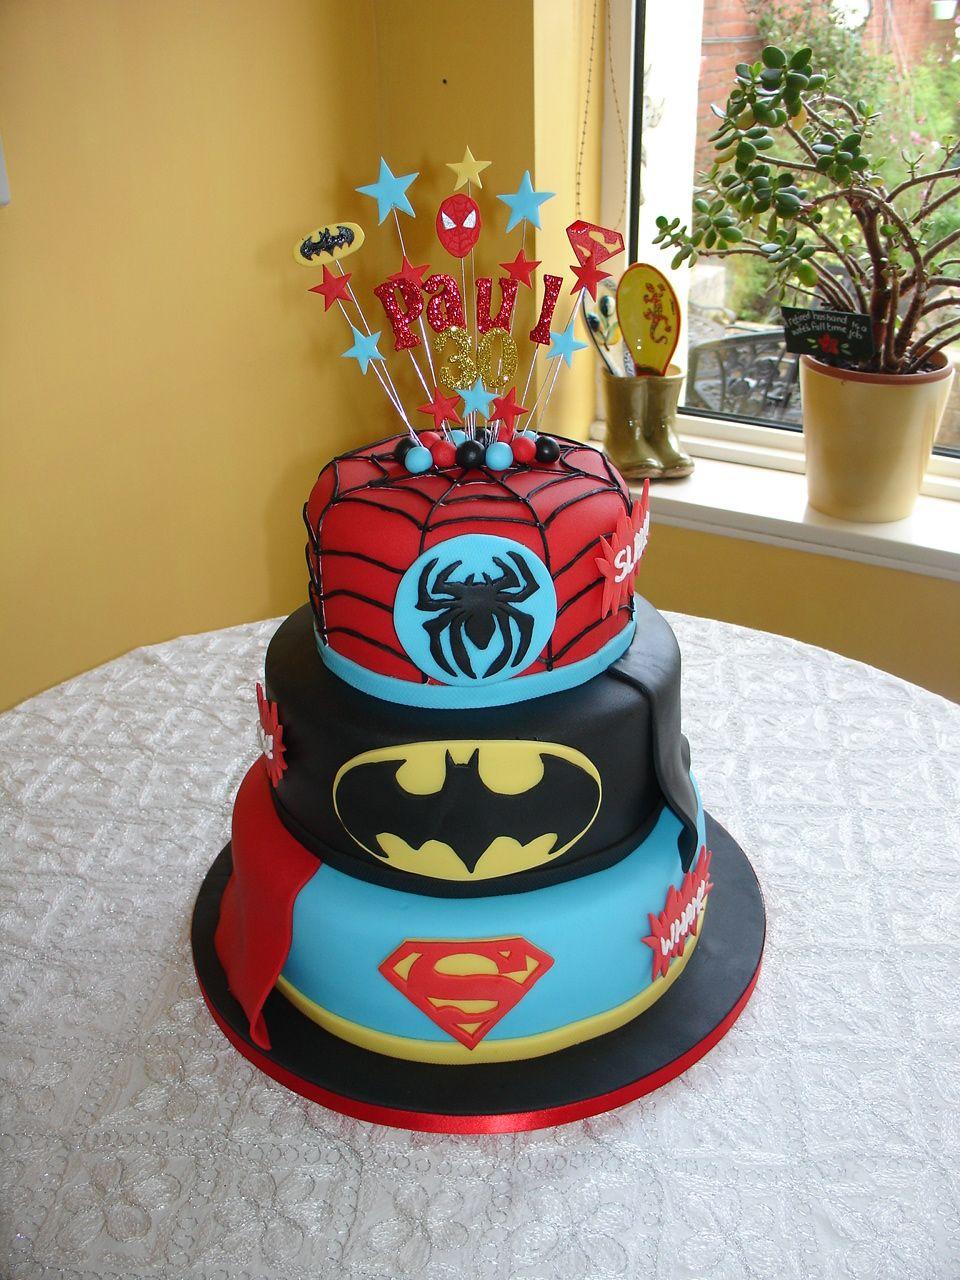 Superheroes 30th Bday Fondant Cake One of the better multisuperhero